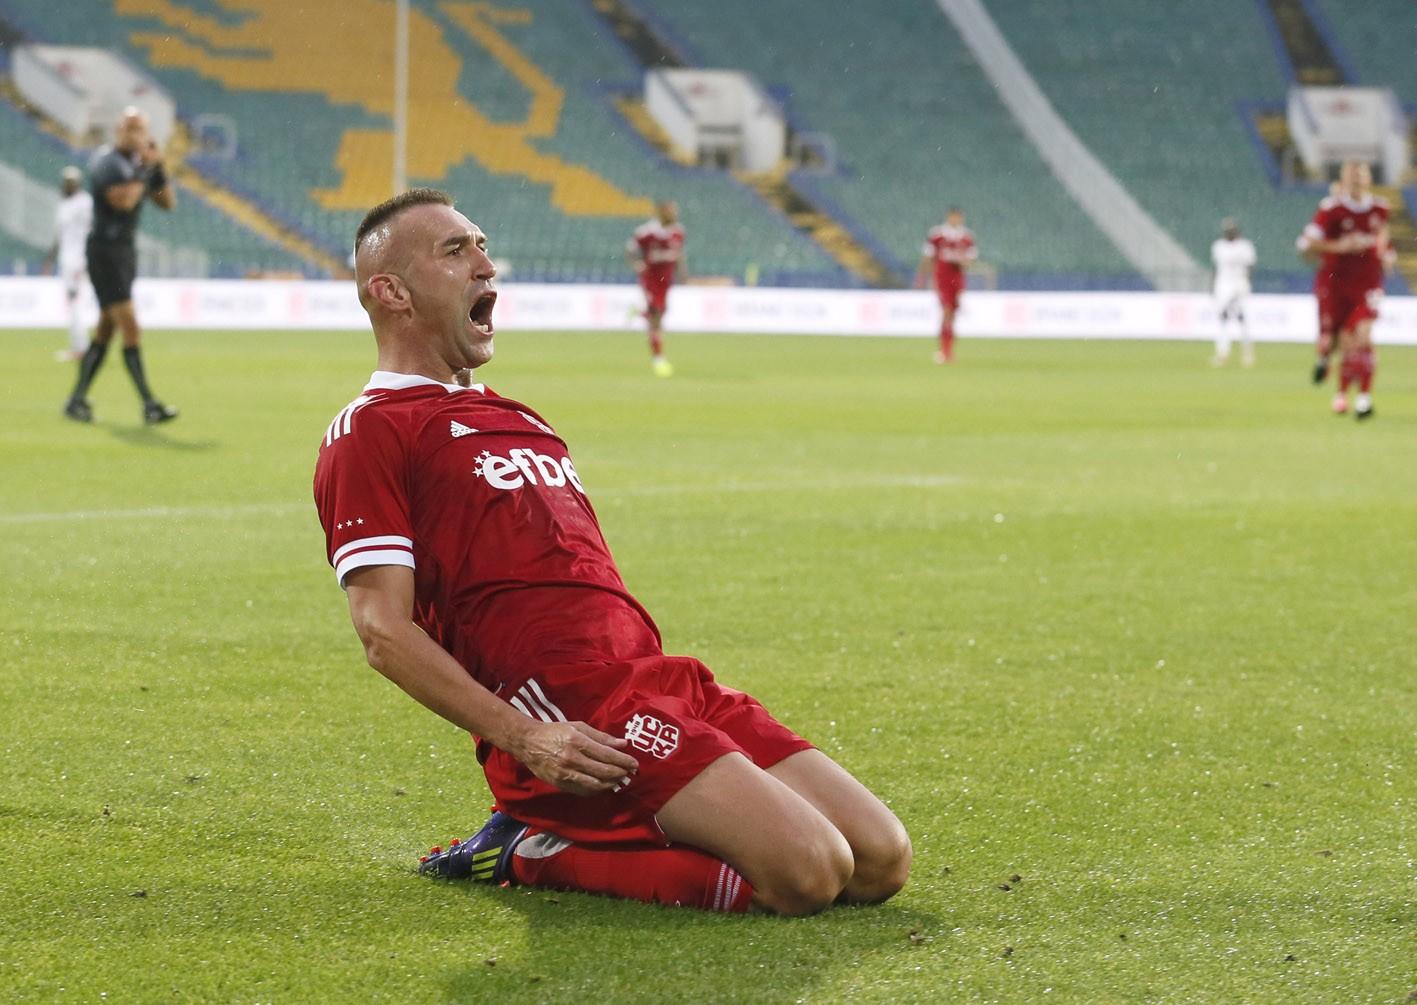 Камбуров: Постигаме перфектни резултати, не мисля да се отказвам 16